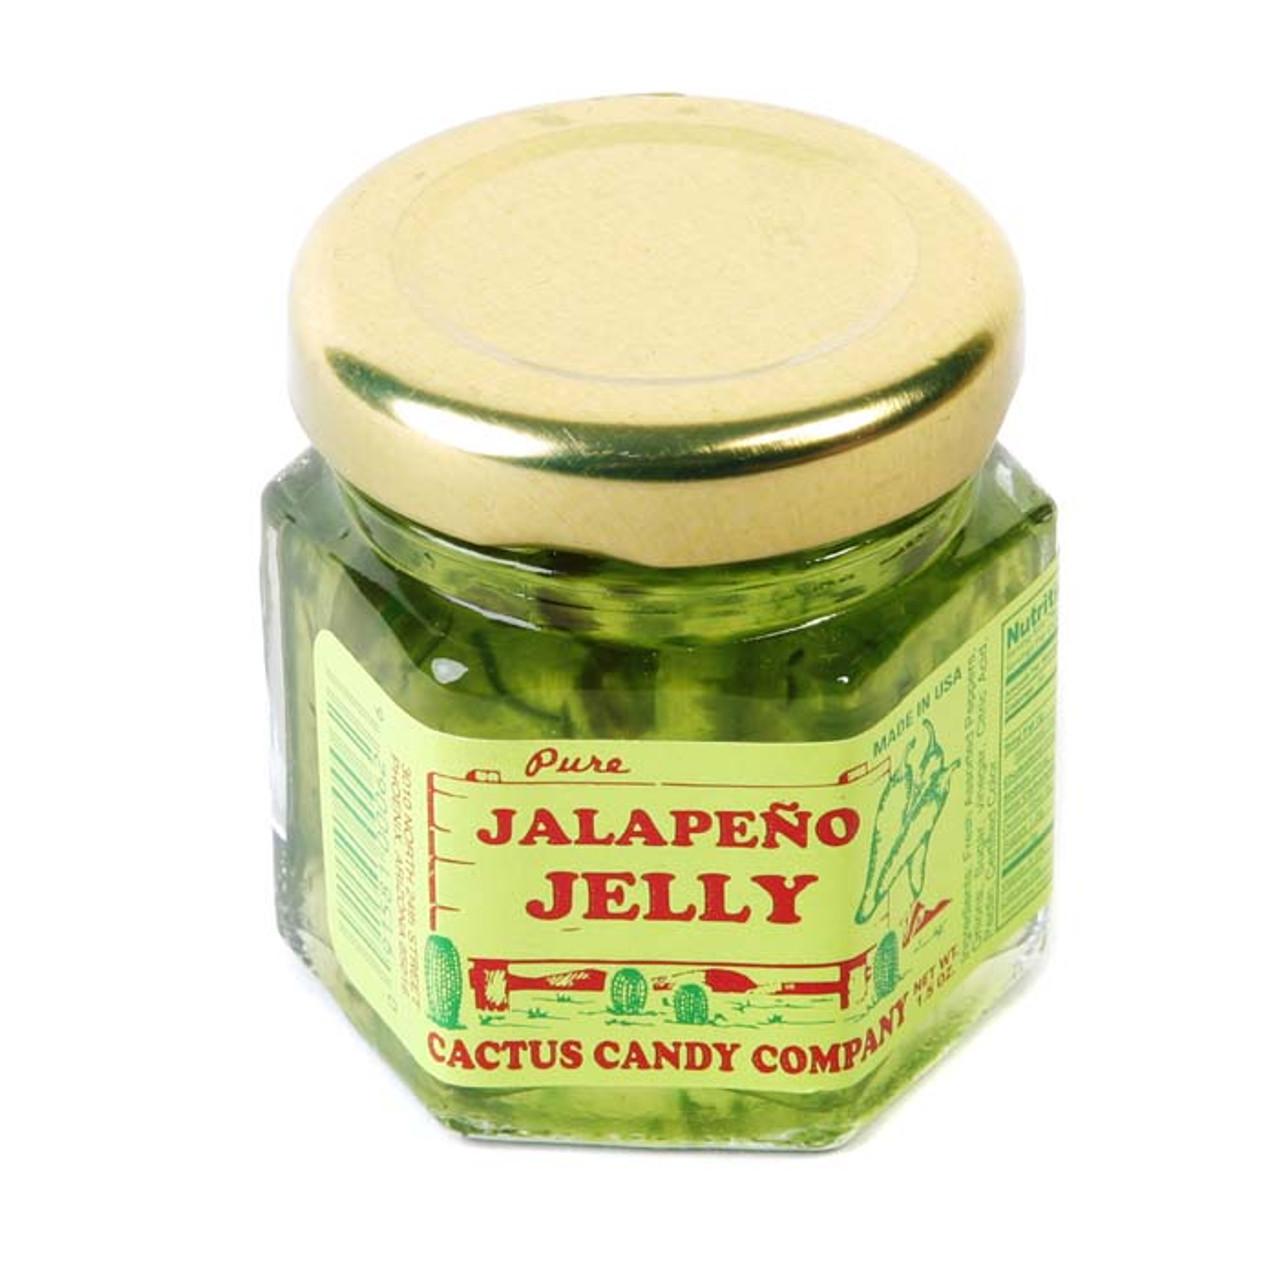 Mini Jalapeno Jelly 1.5oz-Case of 24